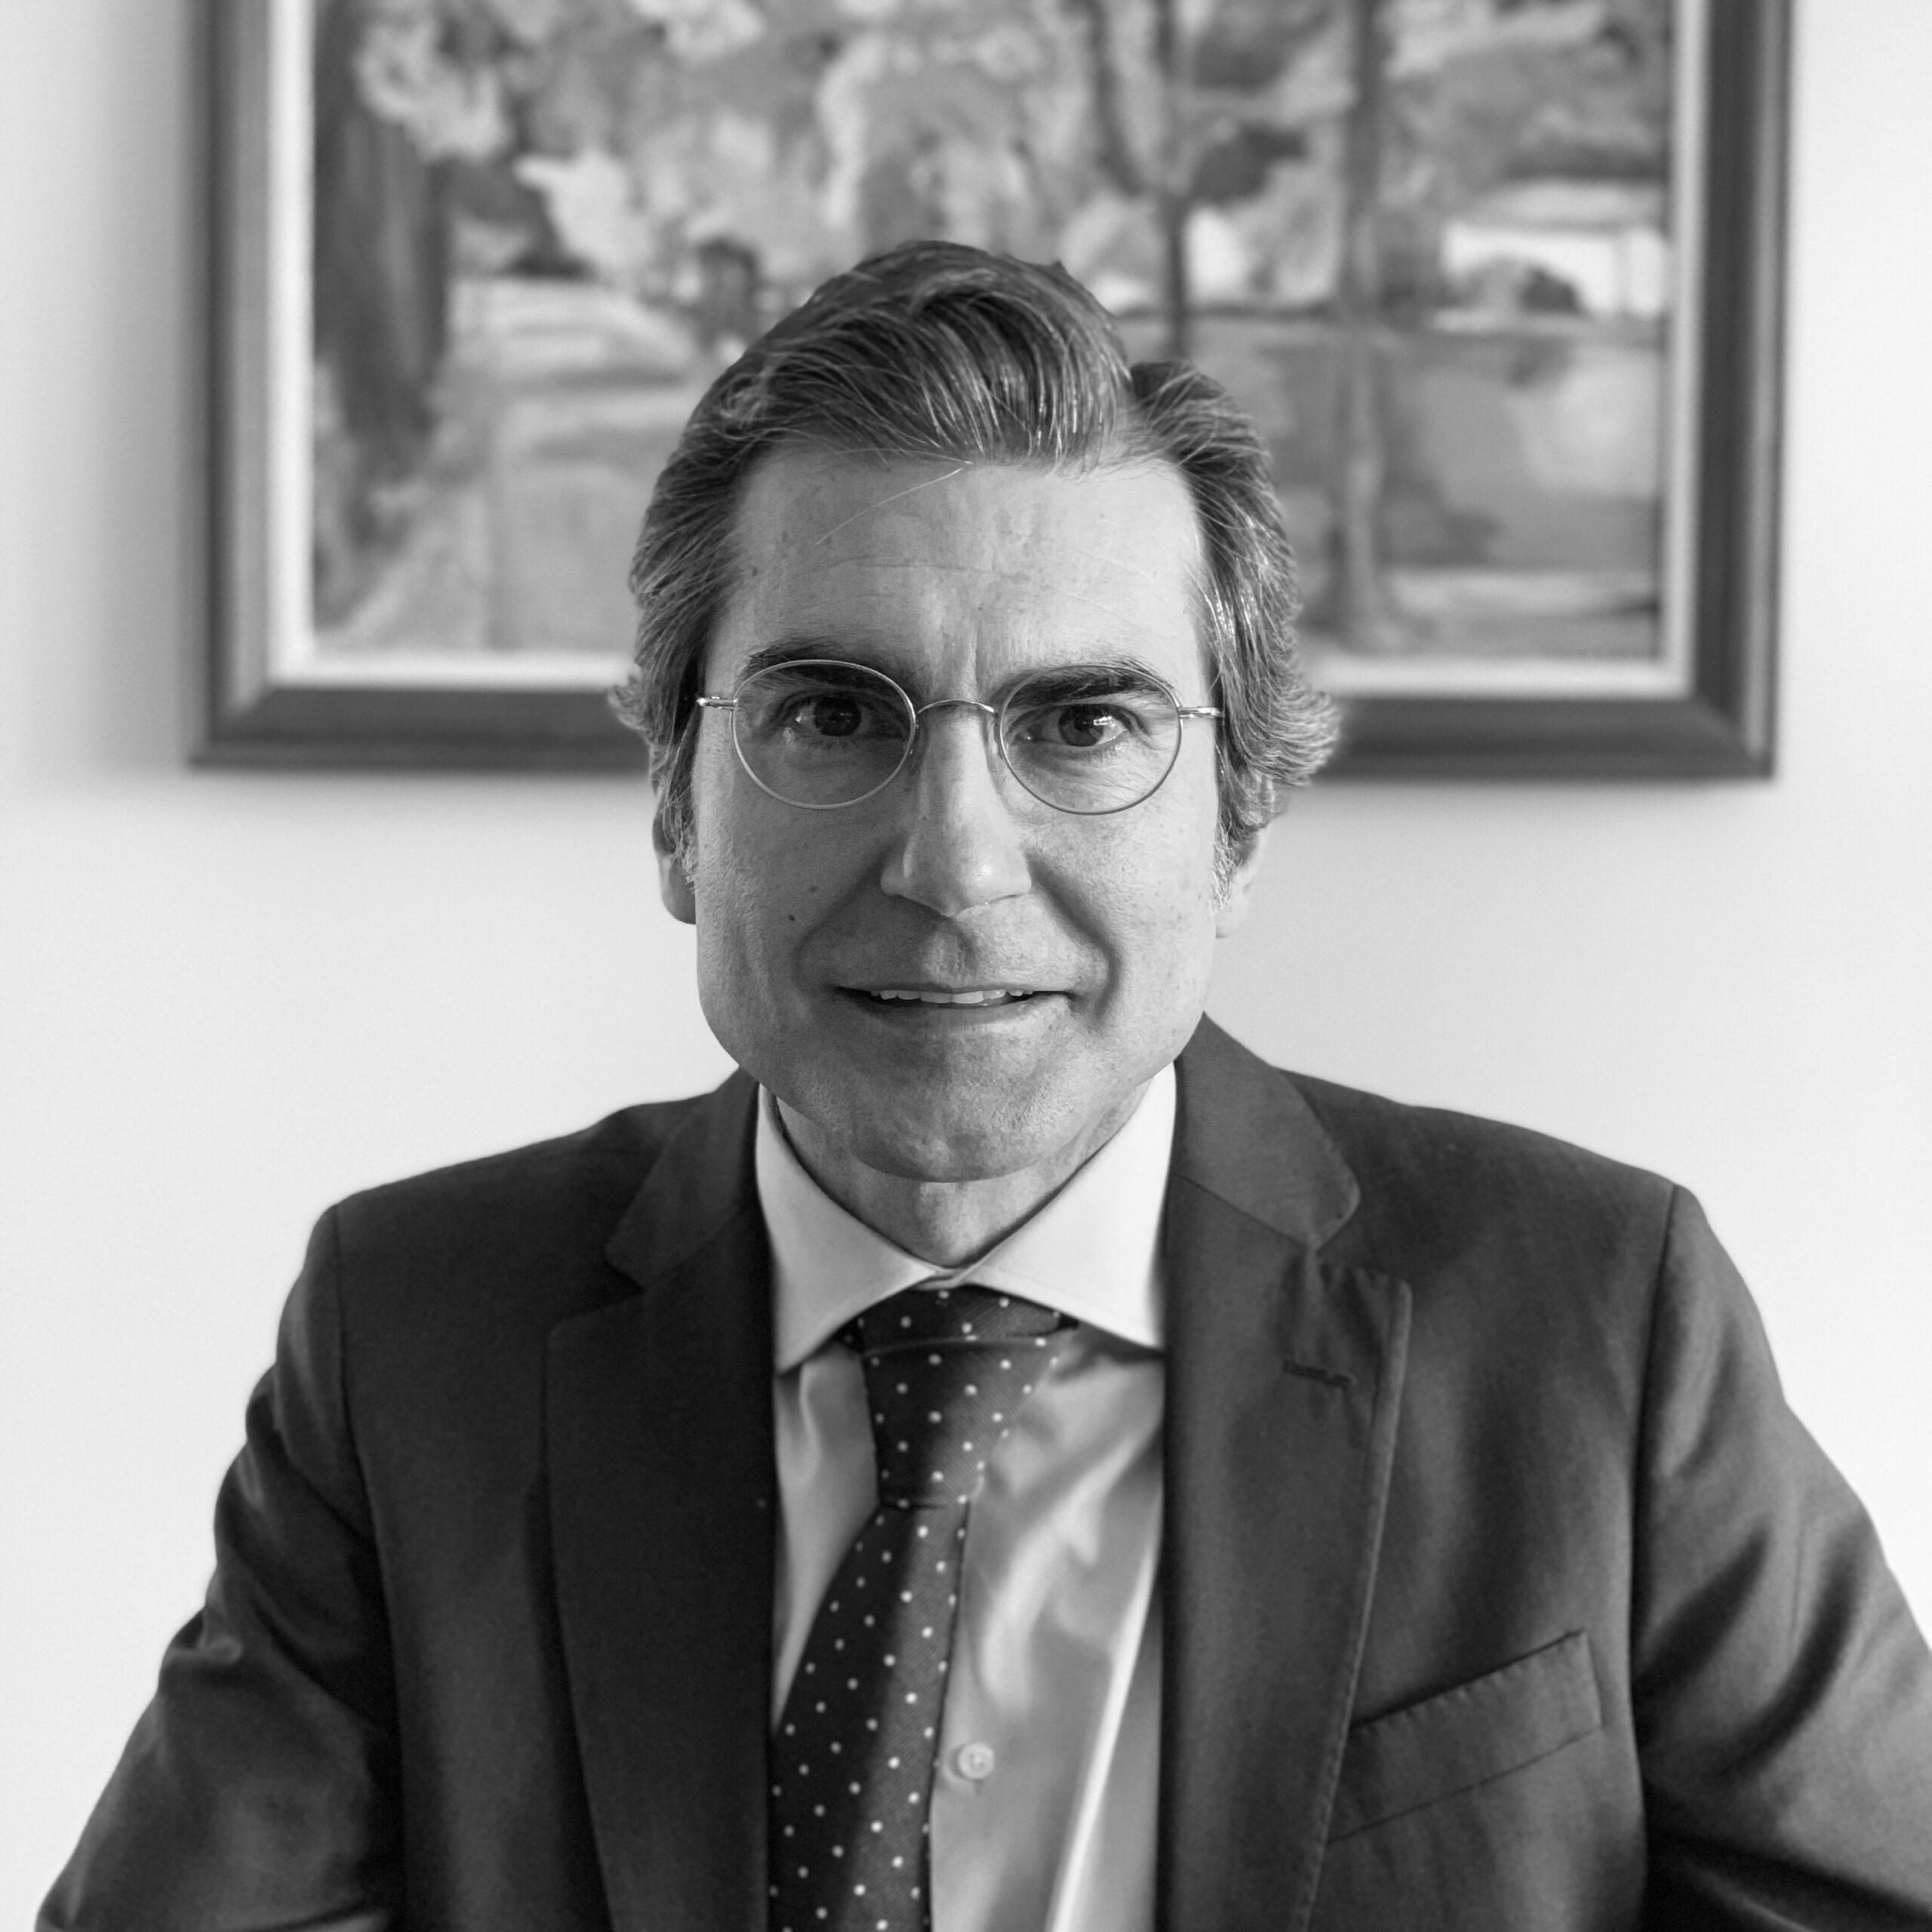 Luis T. De Arriba Hervás